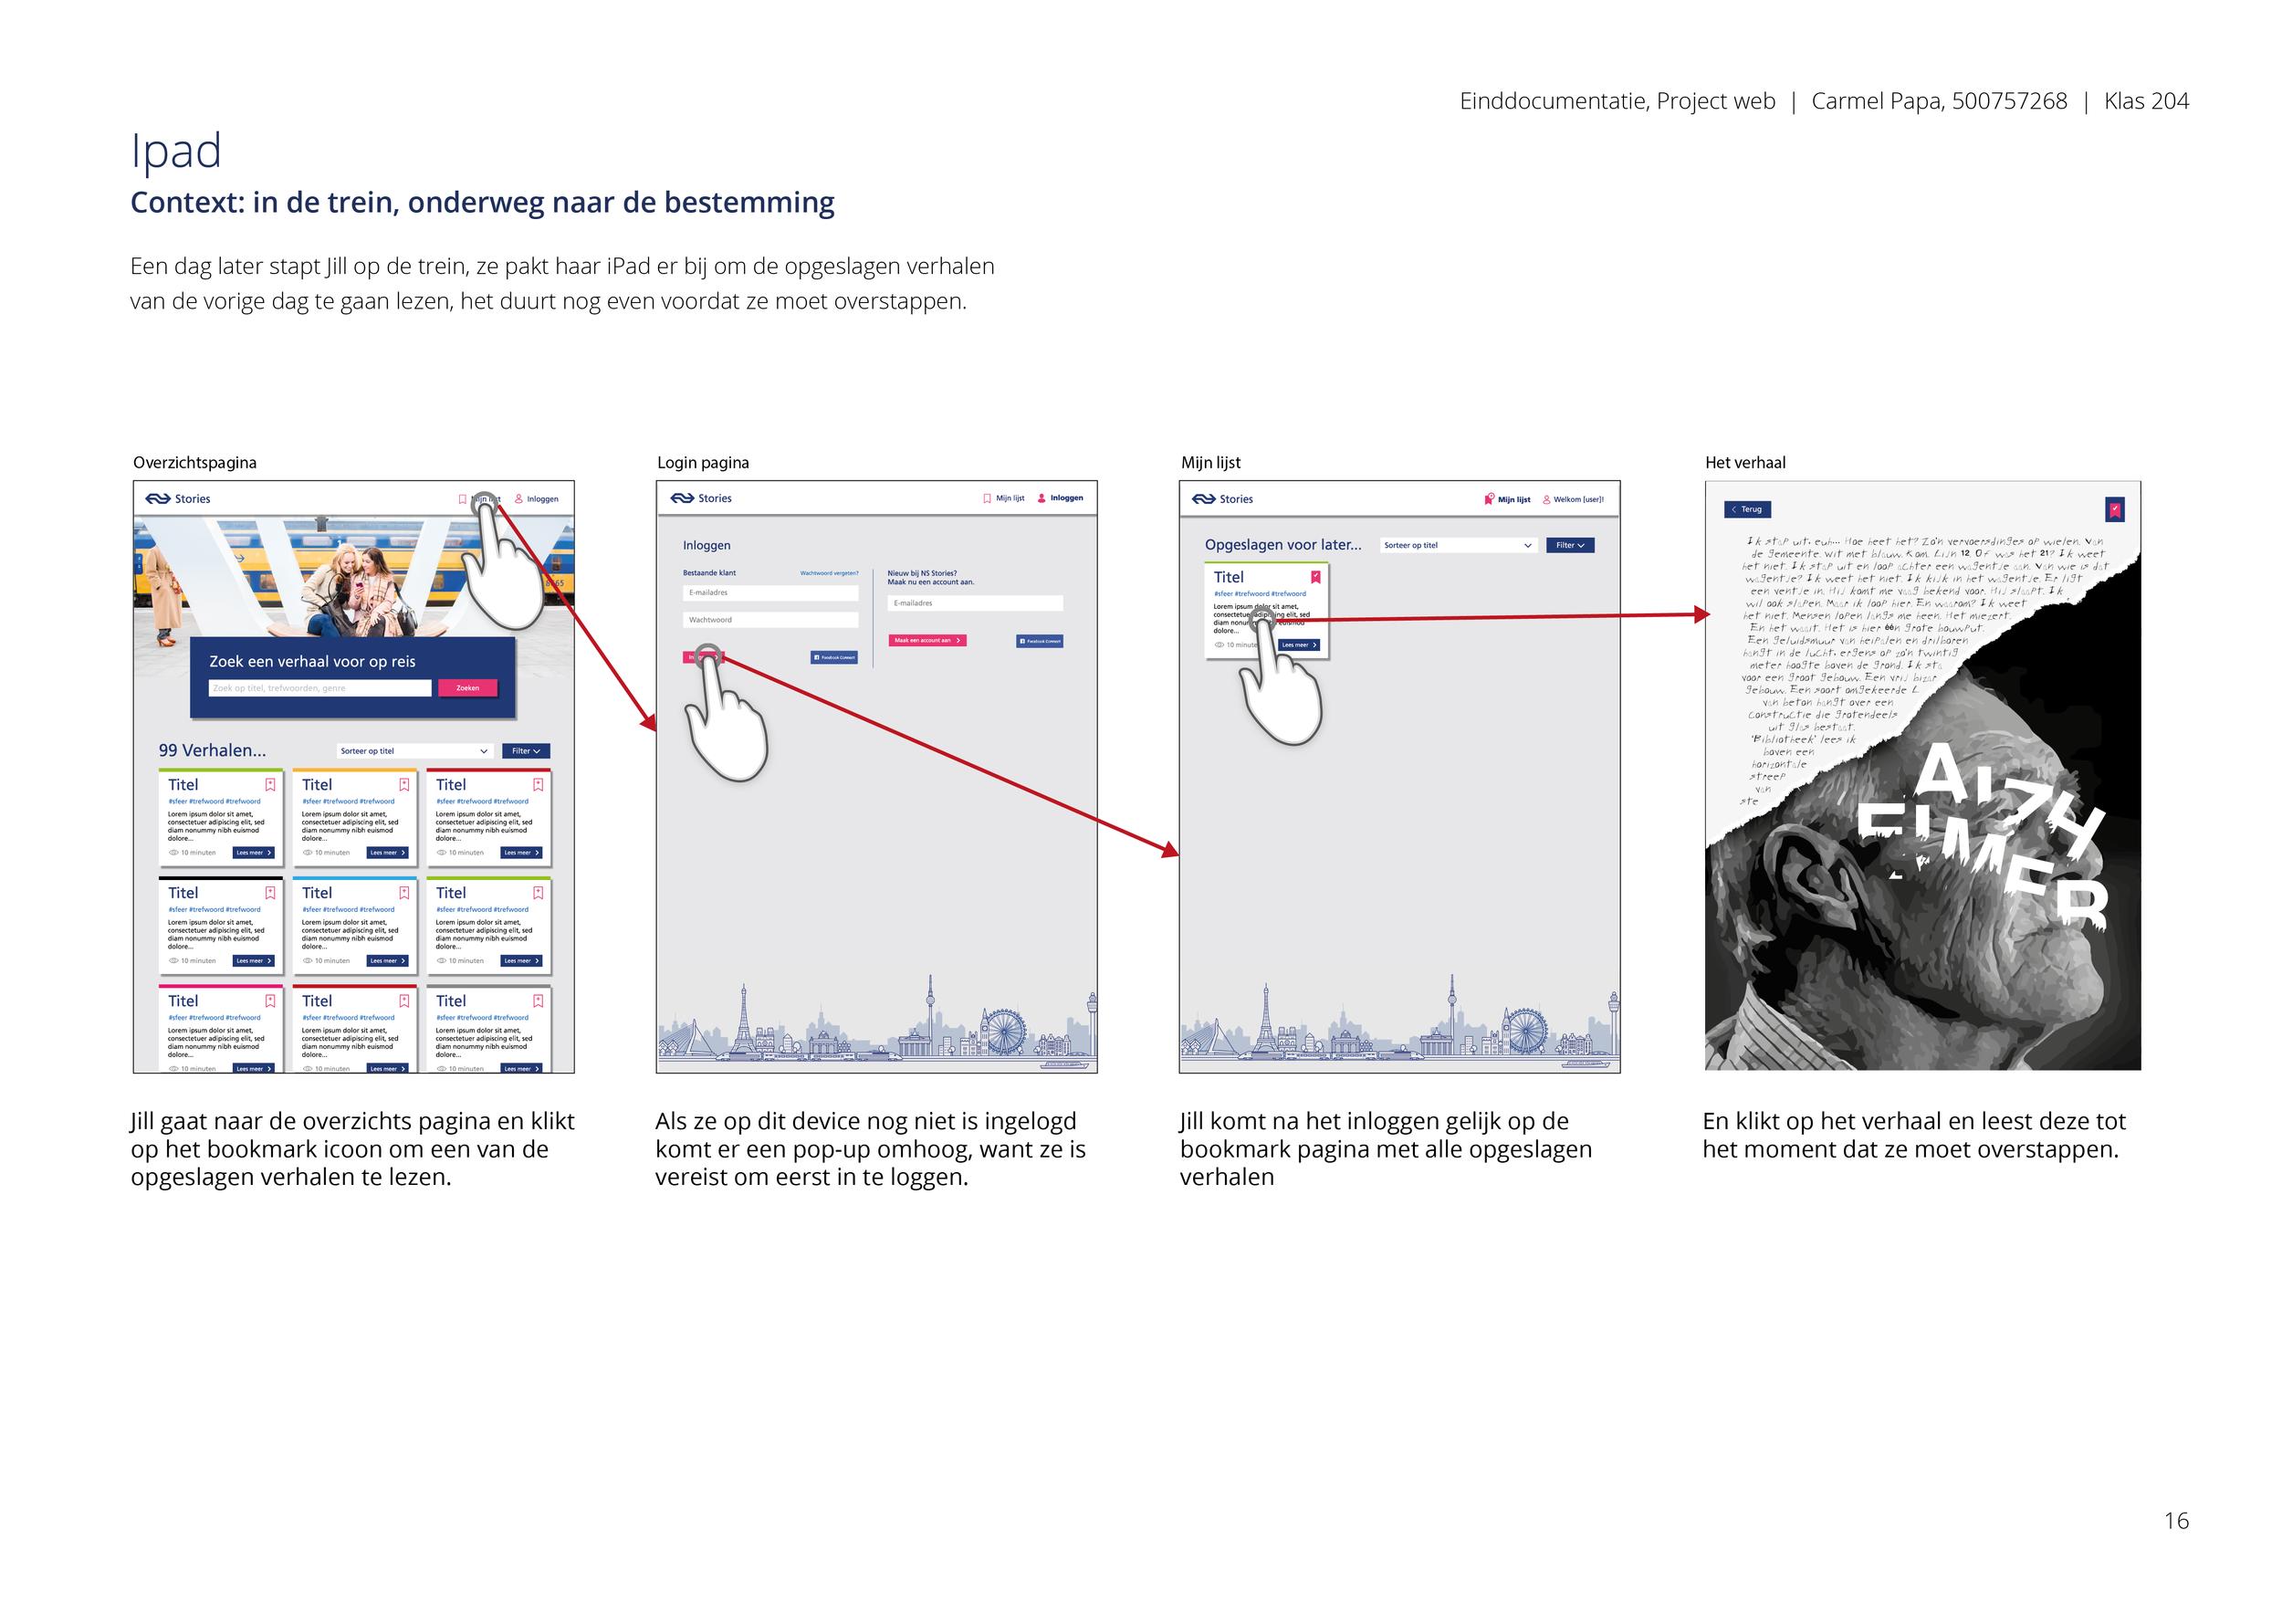 Einddocument_Project Web_Carmel Papa_204_Multidevice wireflow-17.png